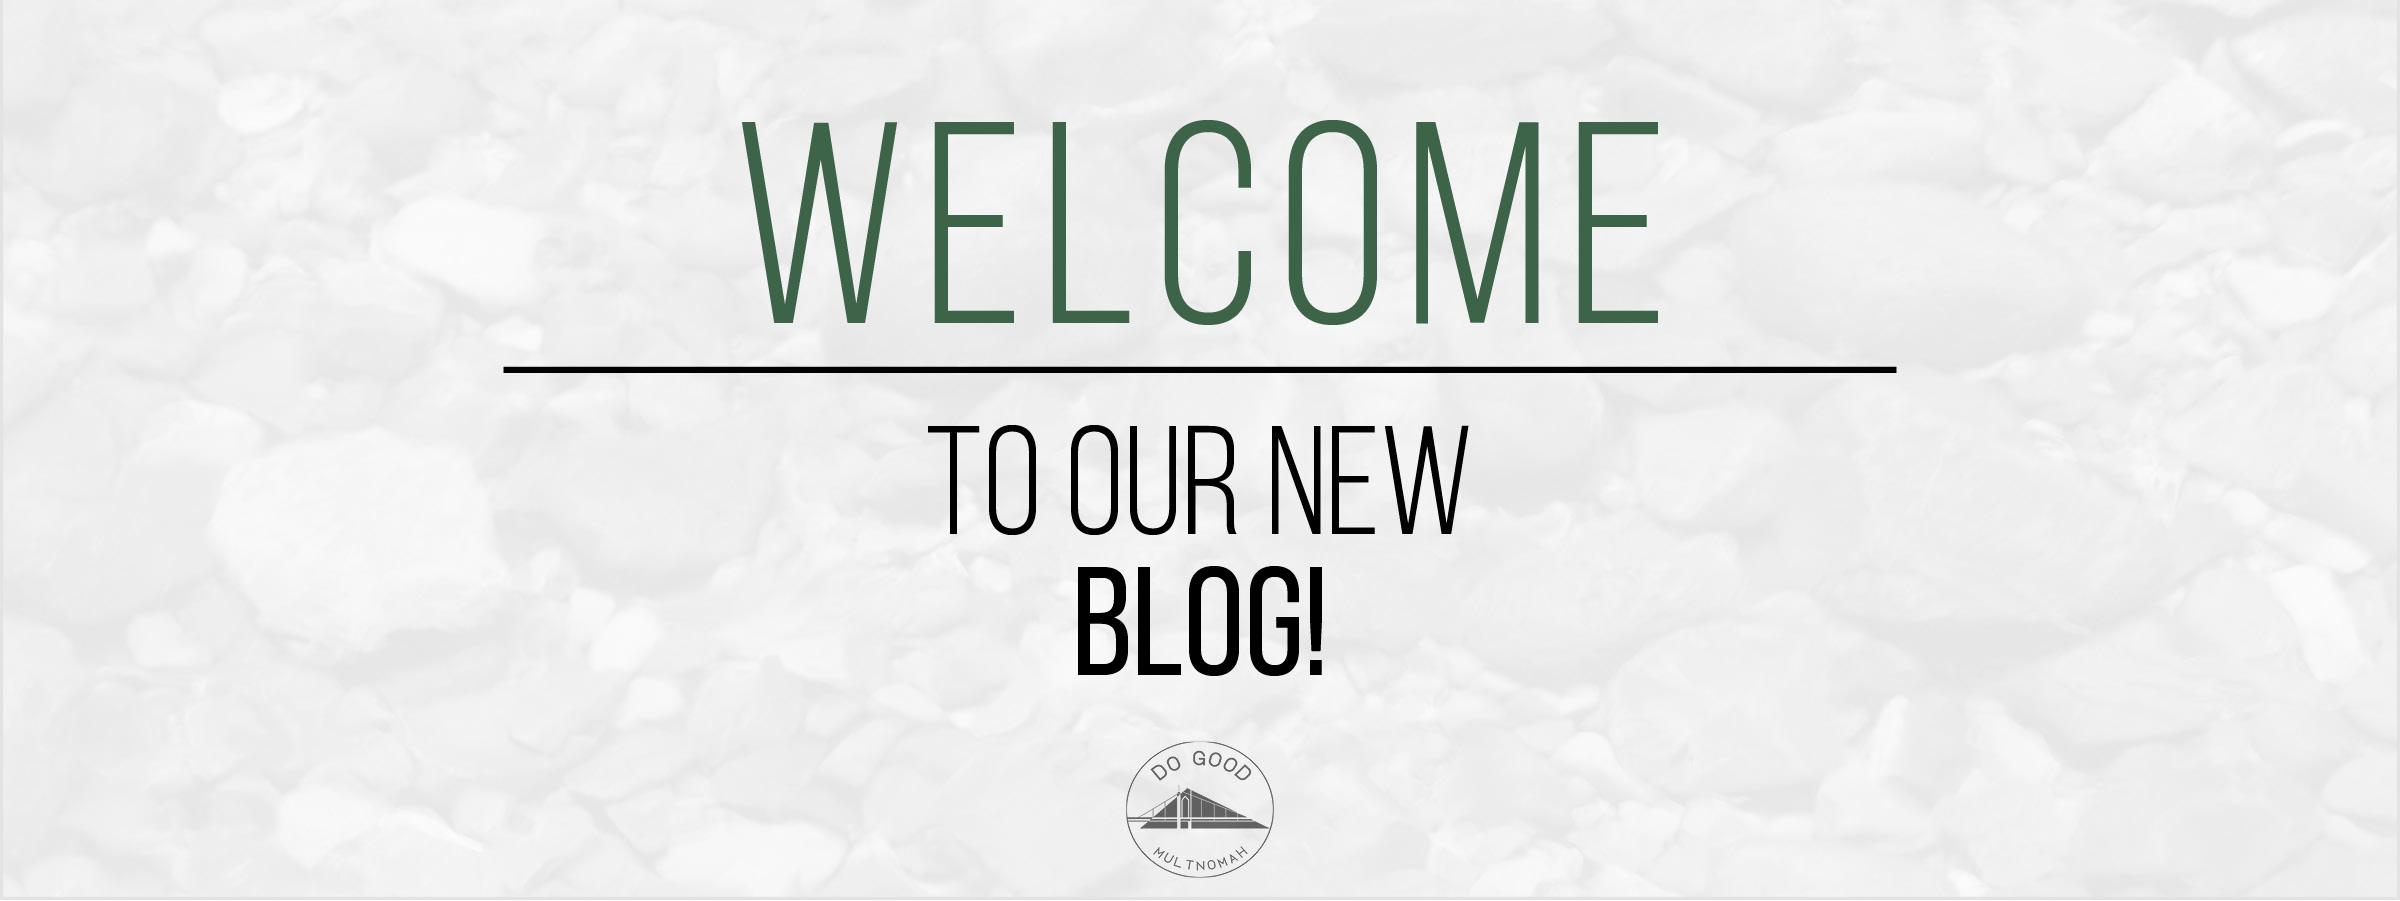 Welcome Blog Banner.jpg